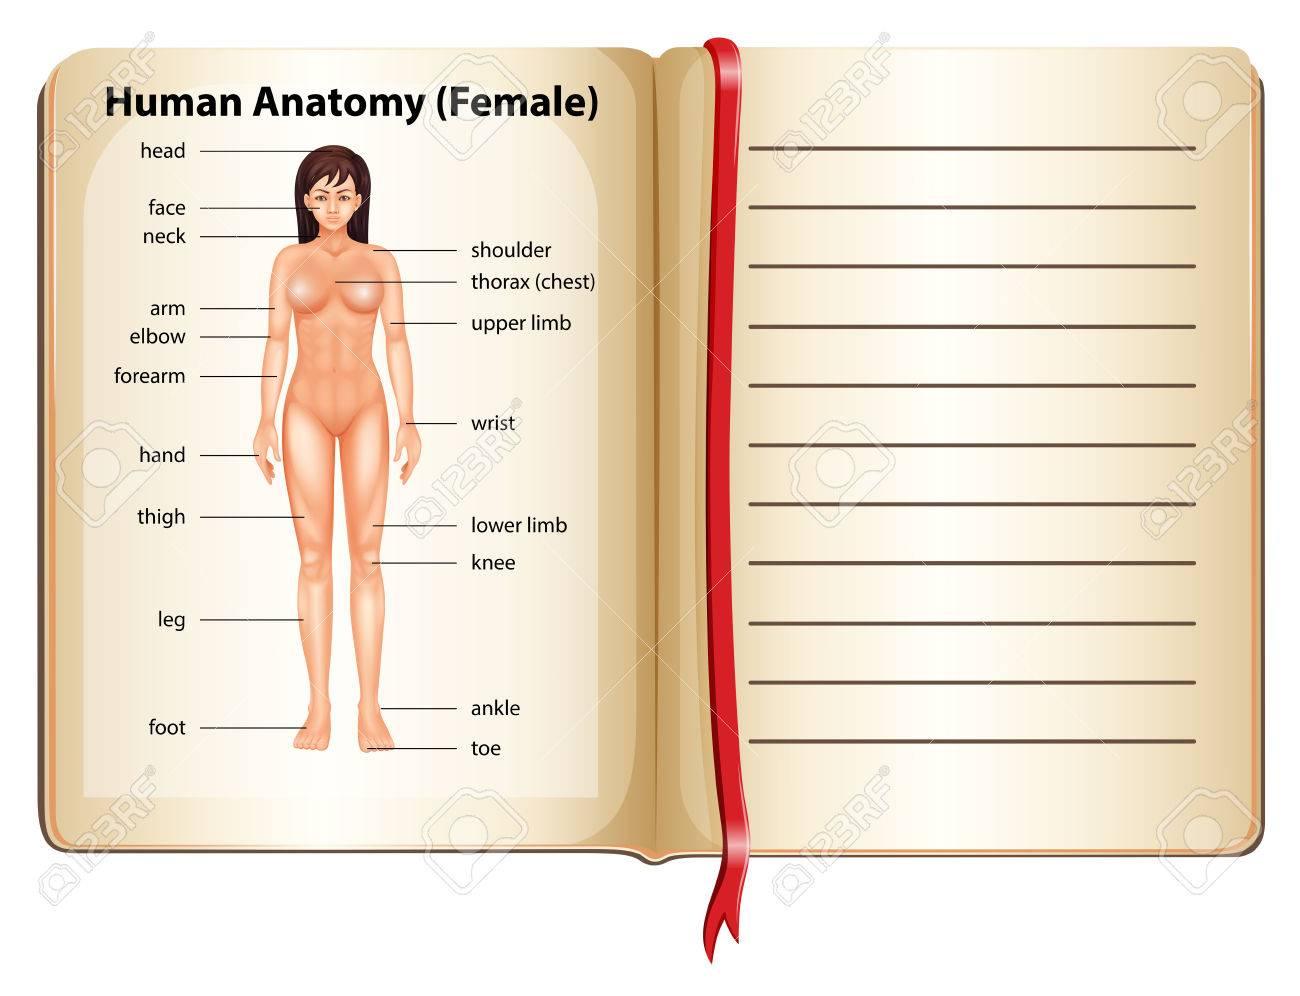 Human Anatomy Of Female Illustration Royalty Free Cliparts, Vectors ...